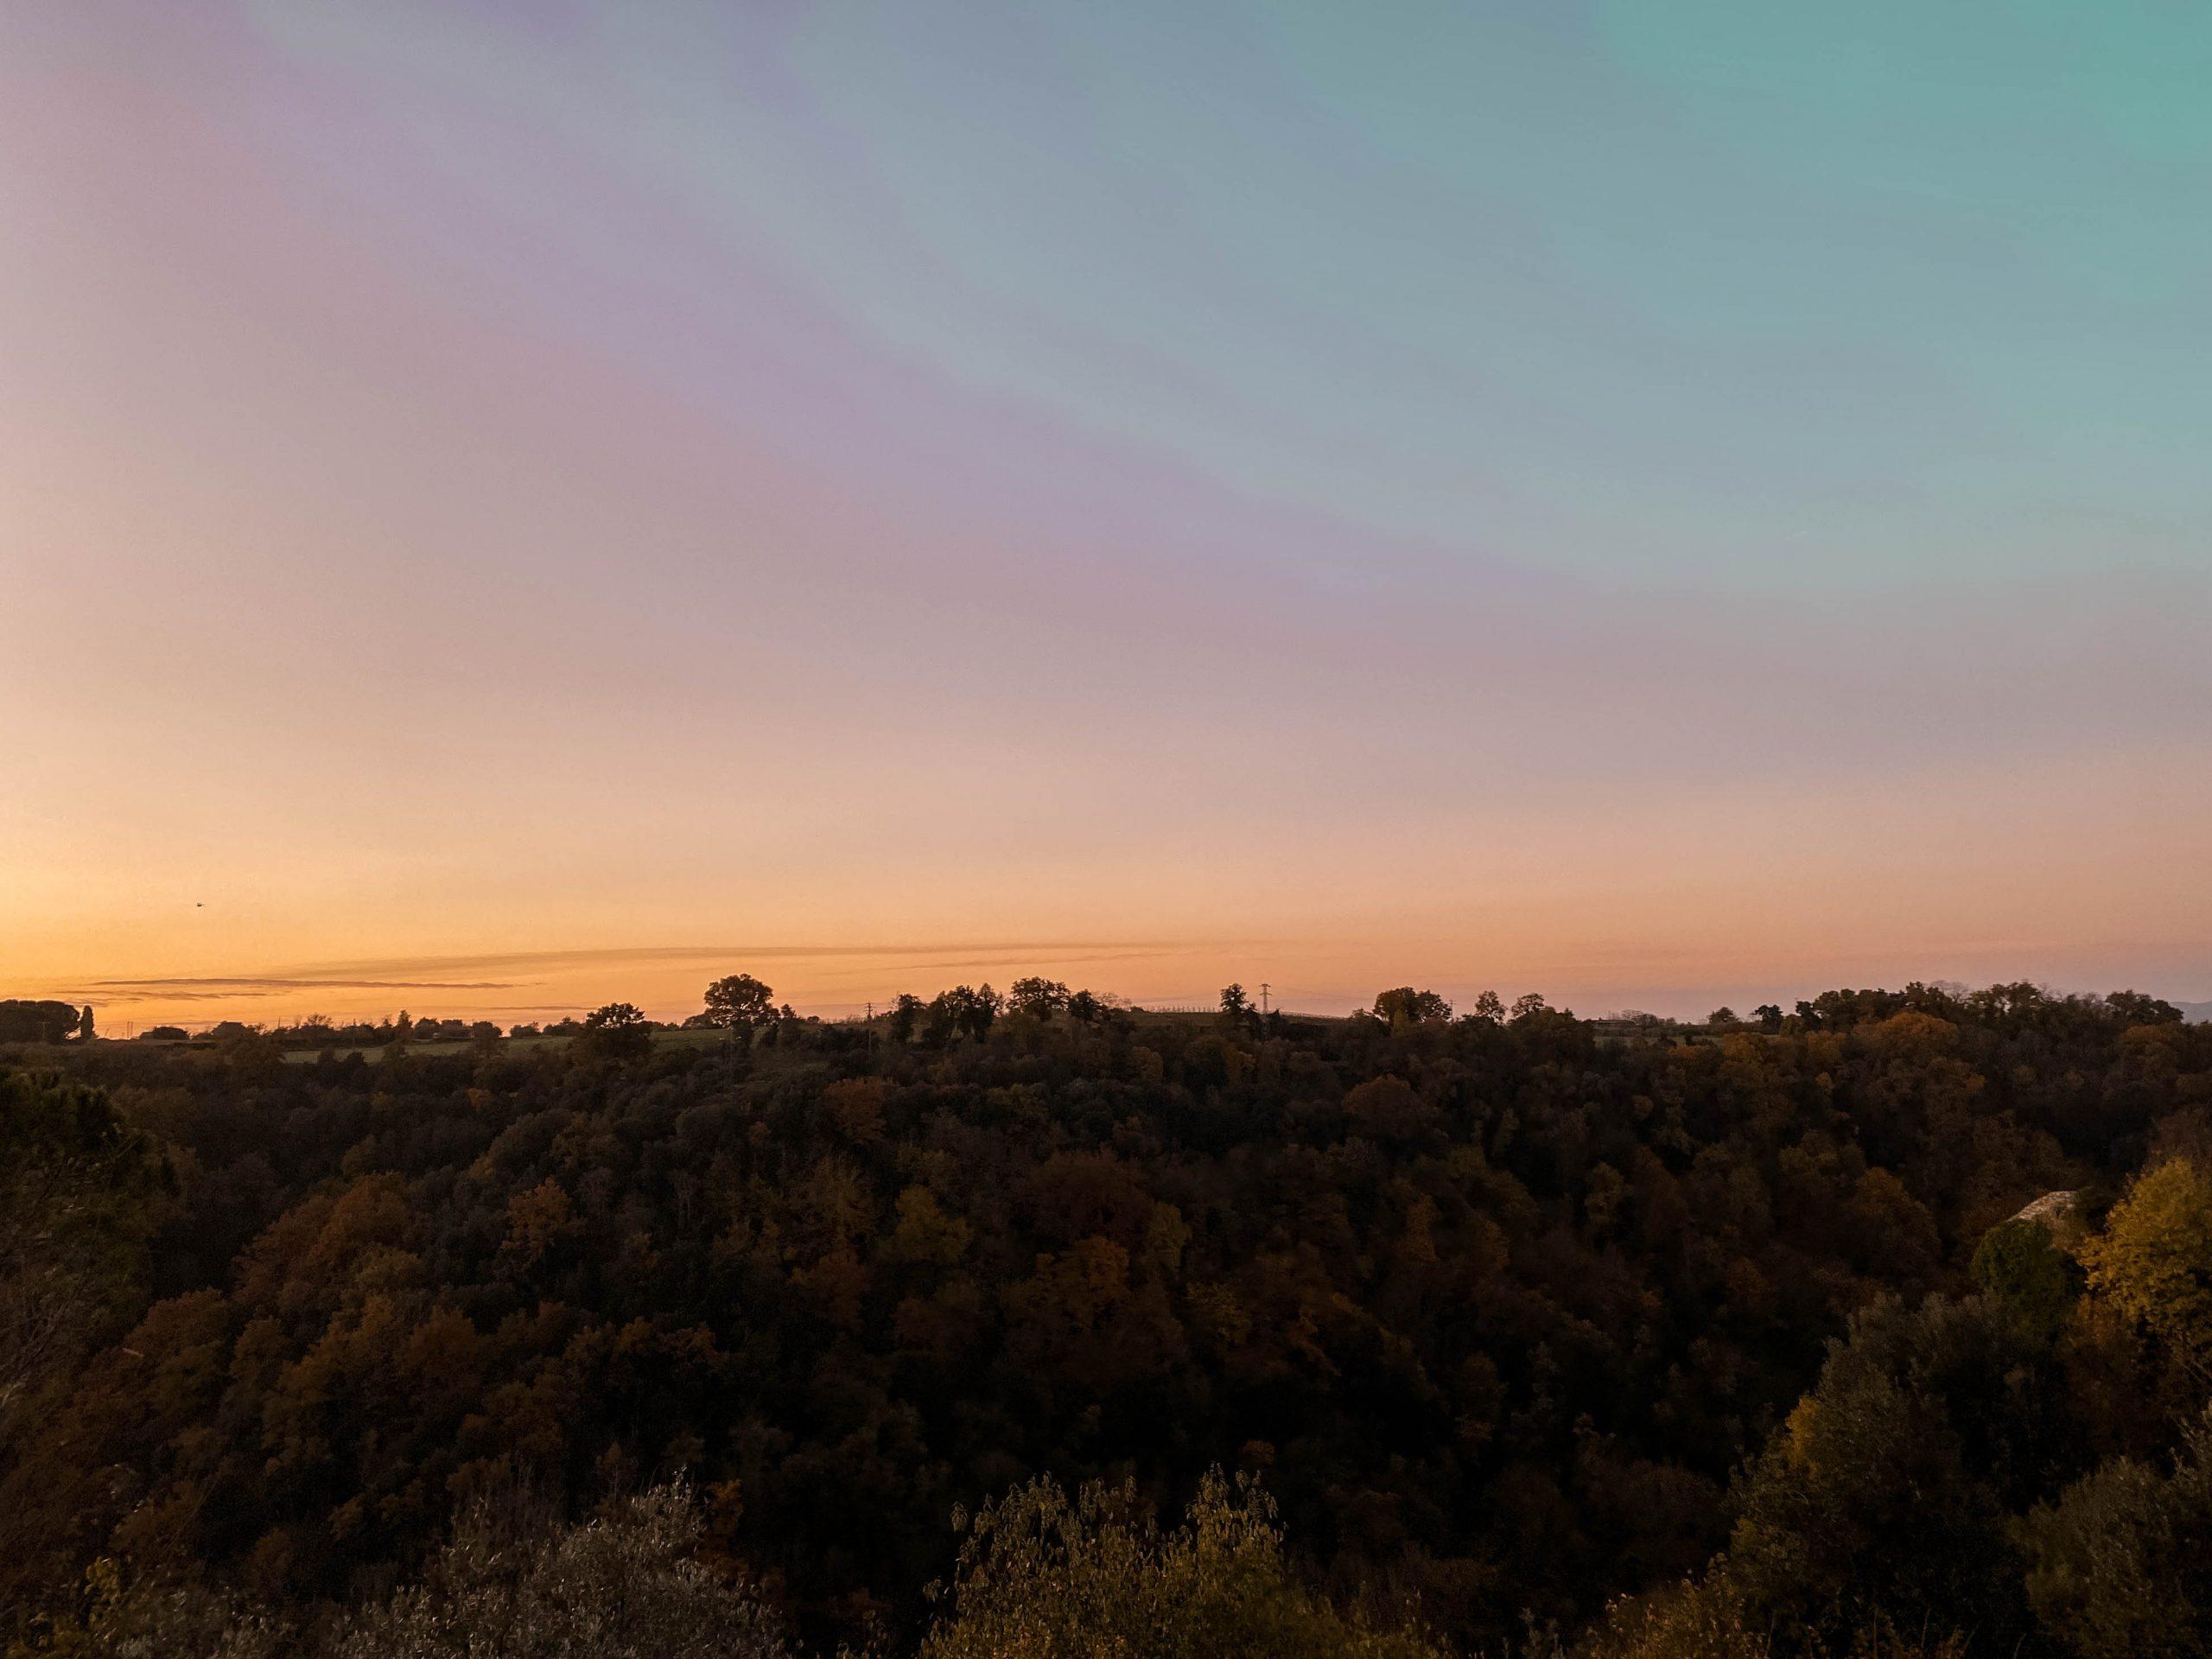 pitigliano tuscany province of grosseto sunrise landscape